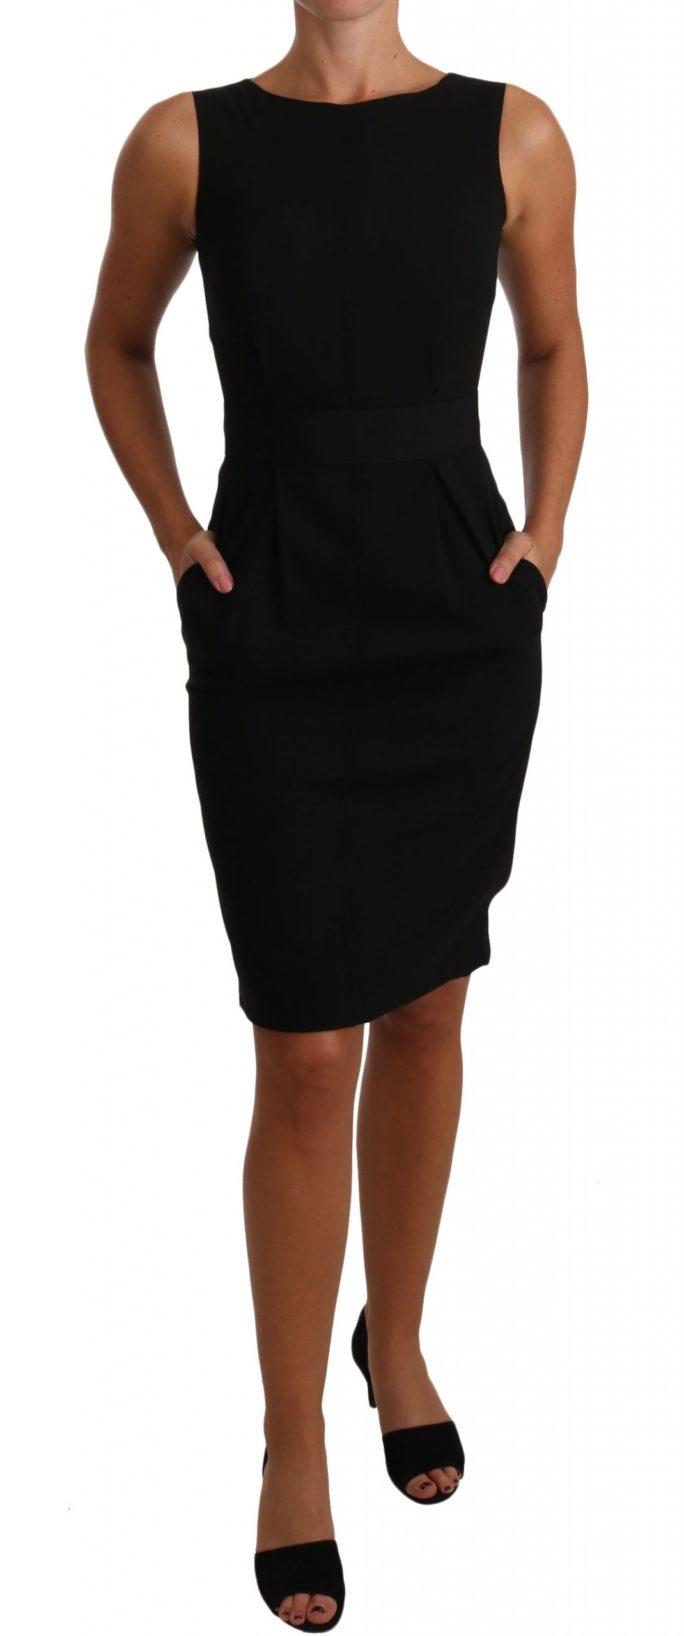 635175 Black Lbd Coctail Pencil Sheath Dress.jpg